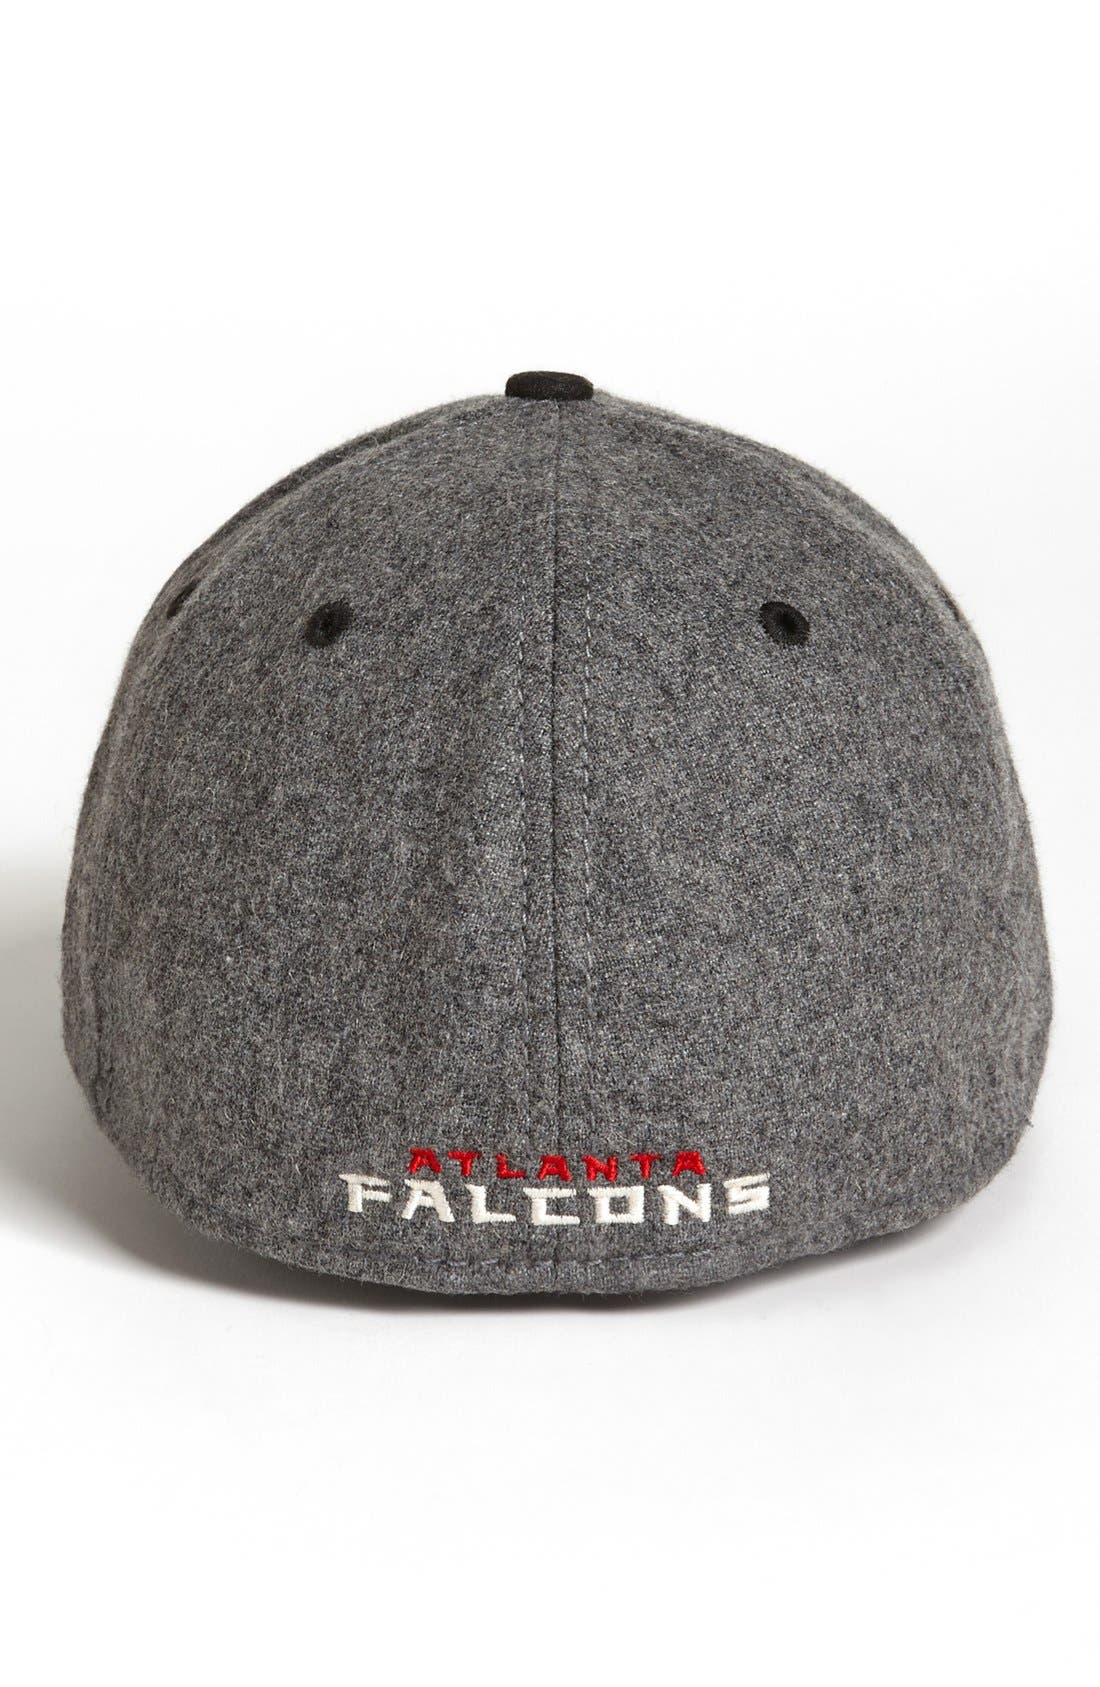 'Meltop - Atlanta Falcons' Fitted Baseball Cap,                             Alternate thumbnail 2, color,                             021